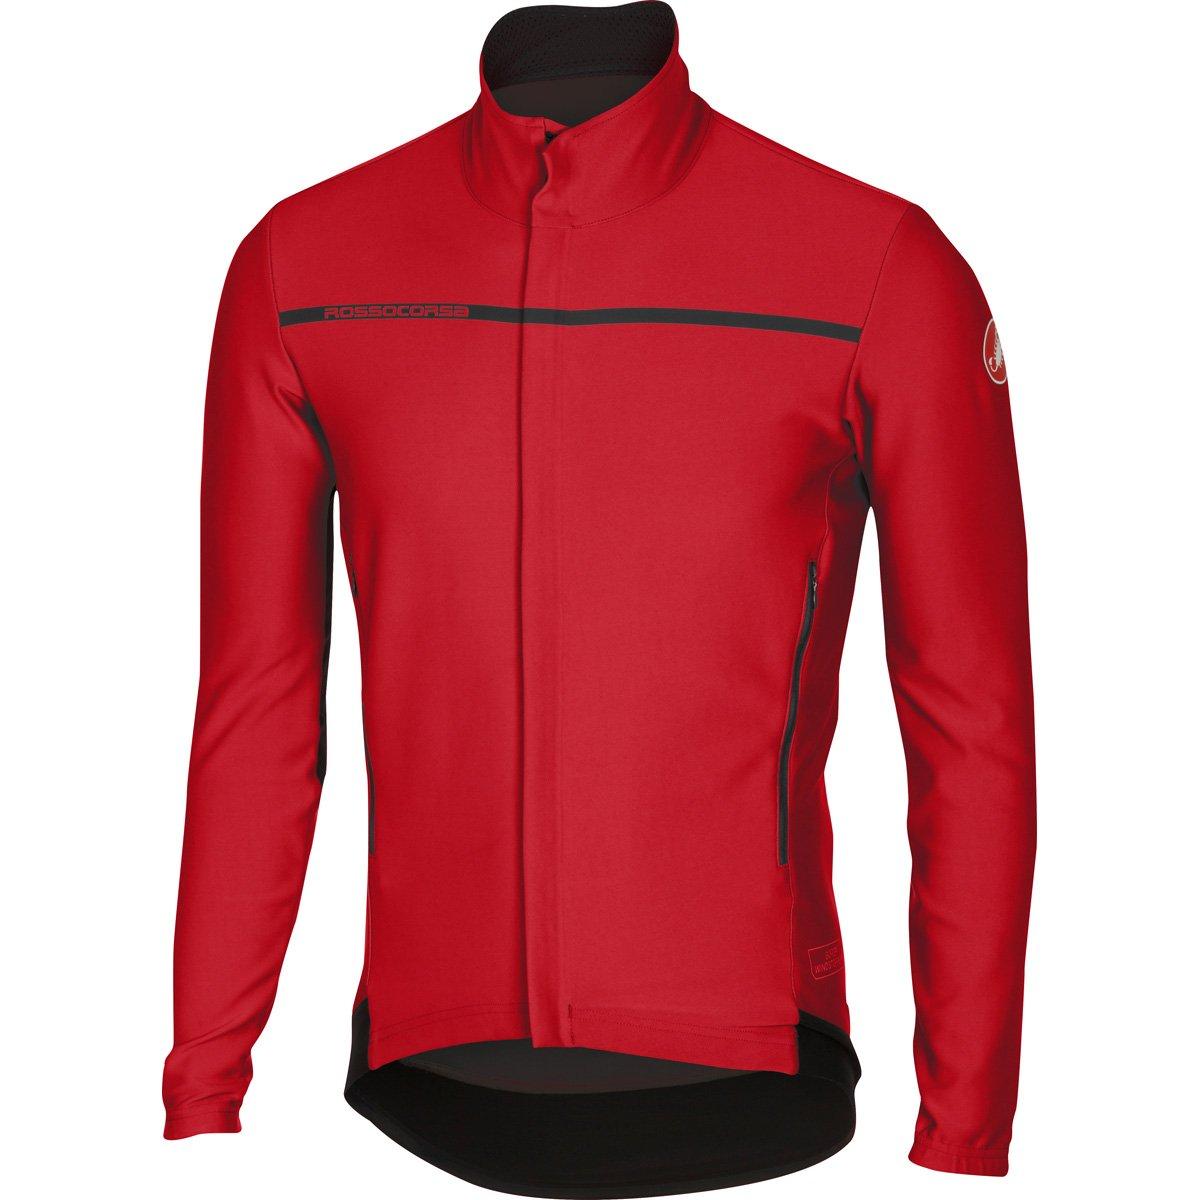 Castelli 2016 / 17メンズPerfetto長袖サイクリングジャケット – b16507 B01LFFC9WA Medium|レッド レッド Medium